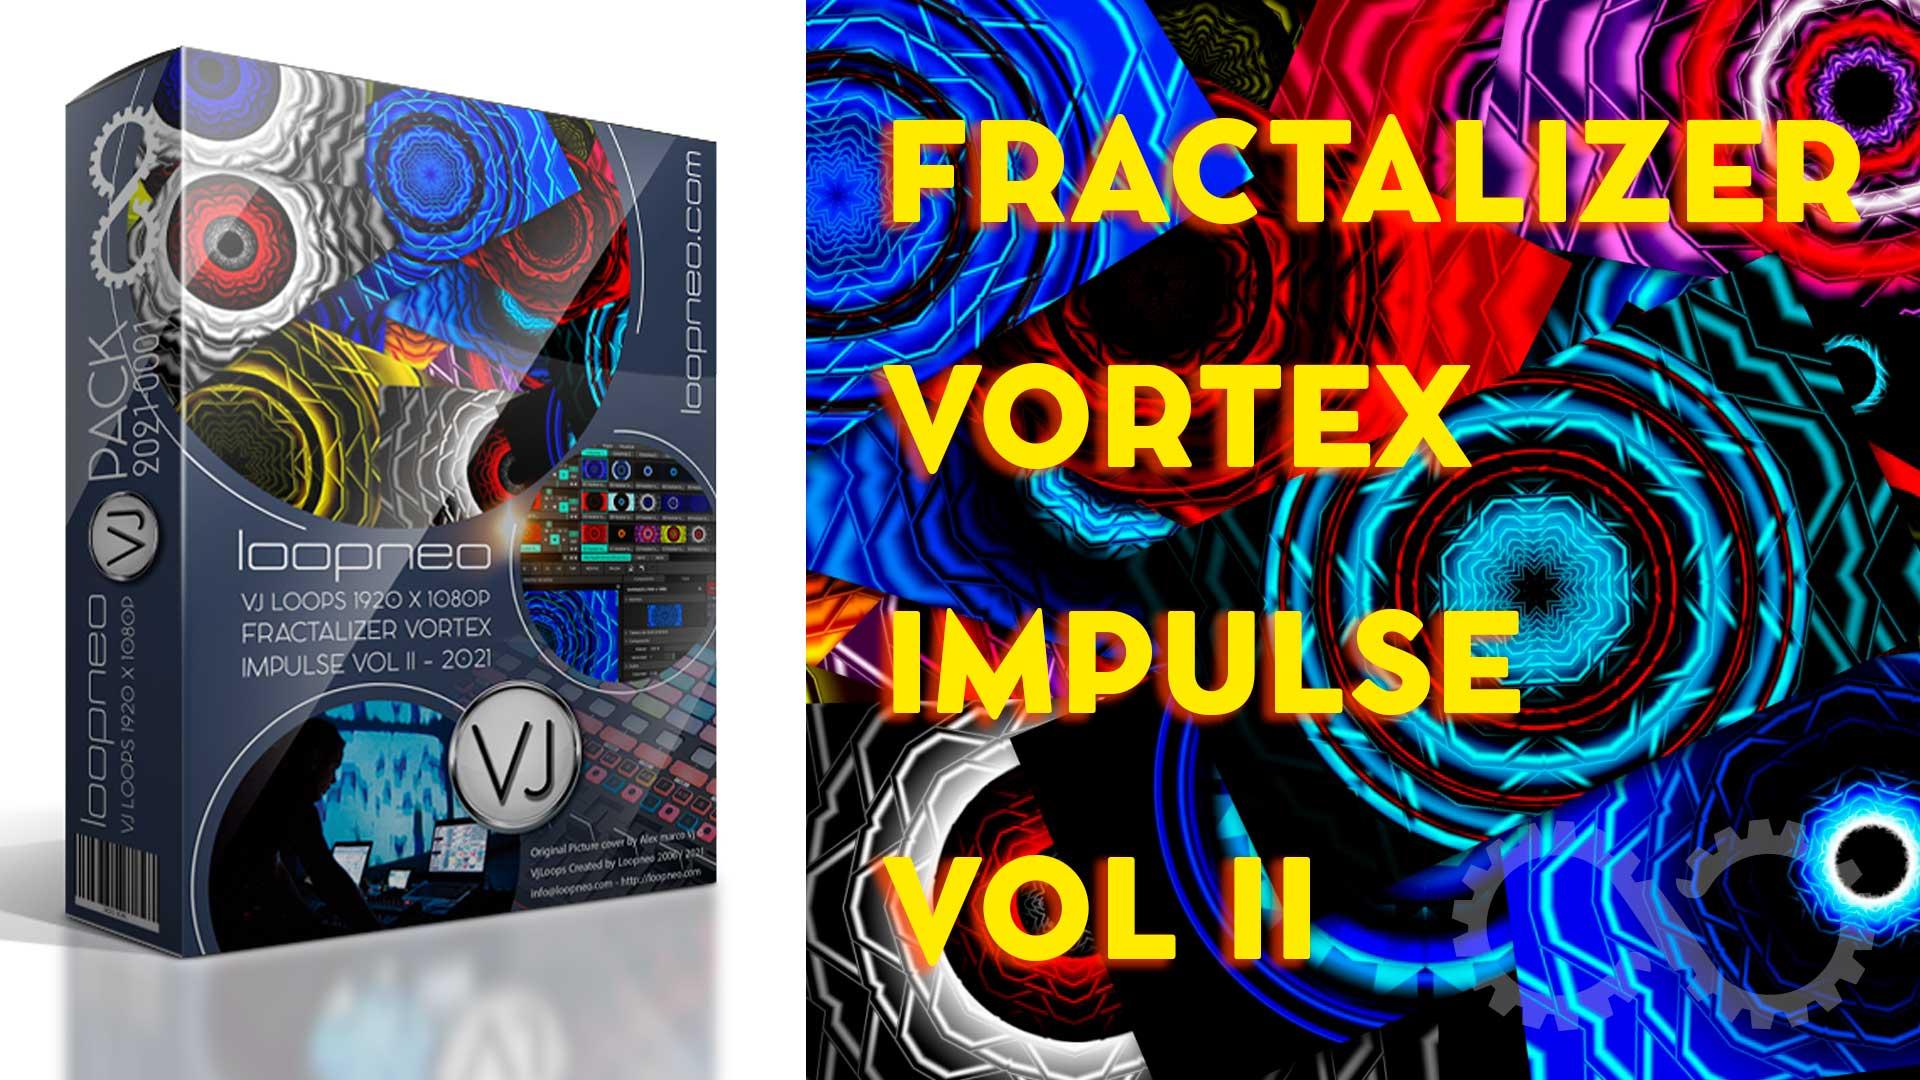 Fractalizer Vortex Impulse Vol II